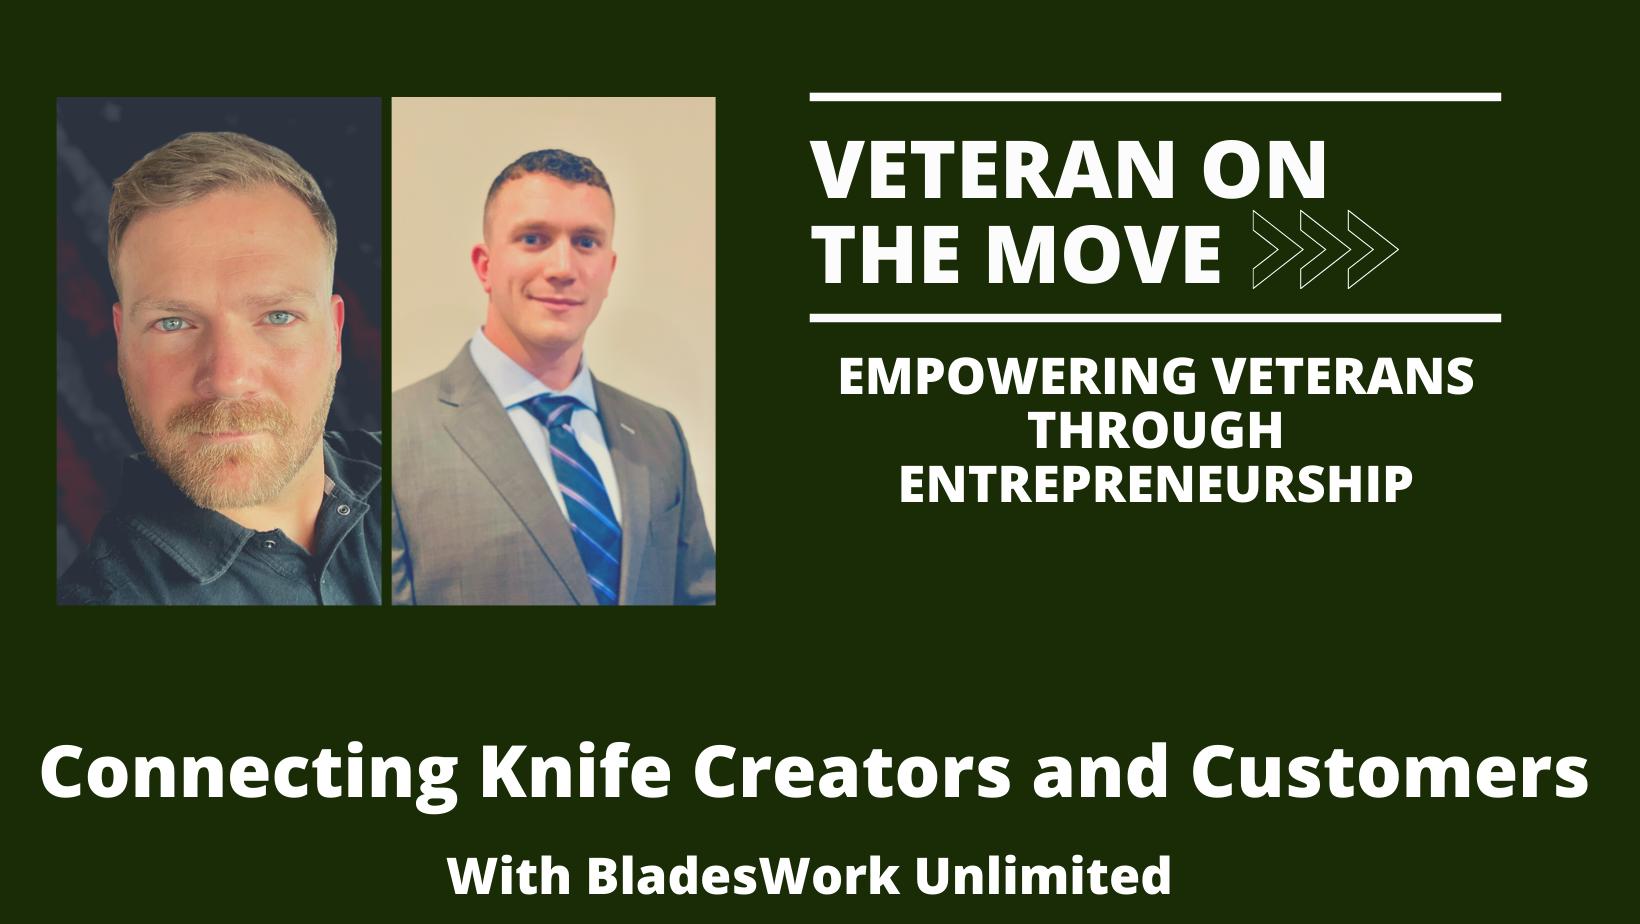 BladesWork Unlimited, Veteran On The Move